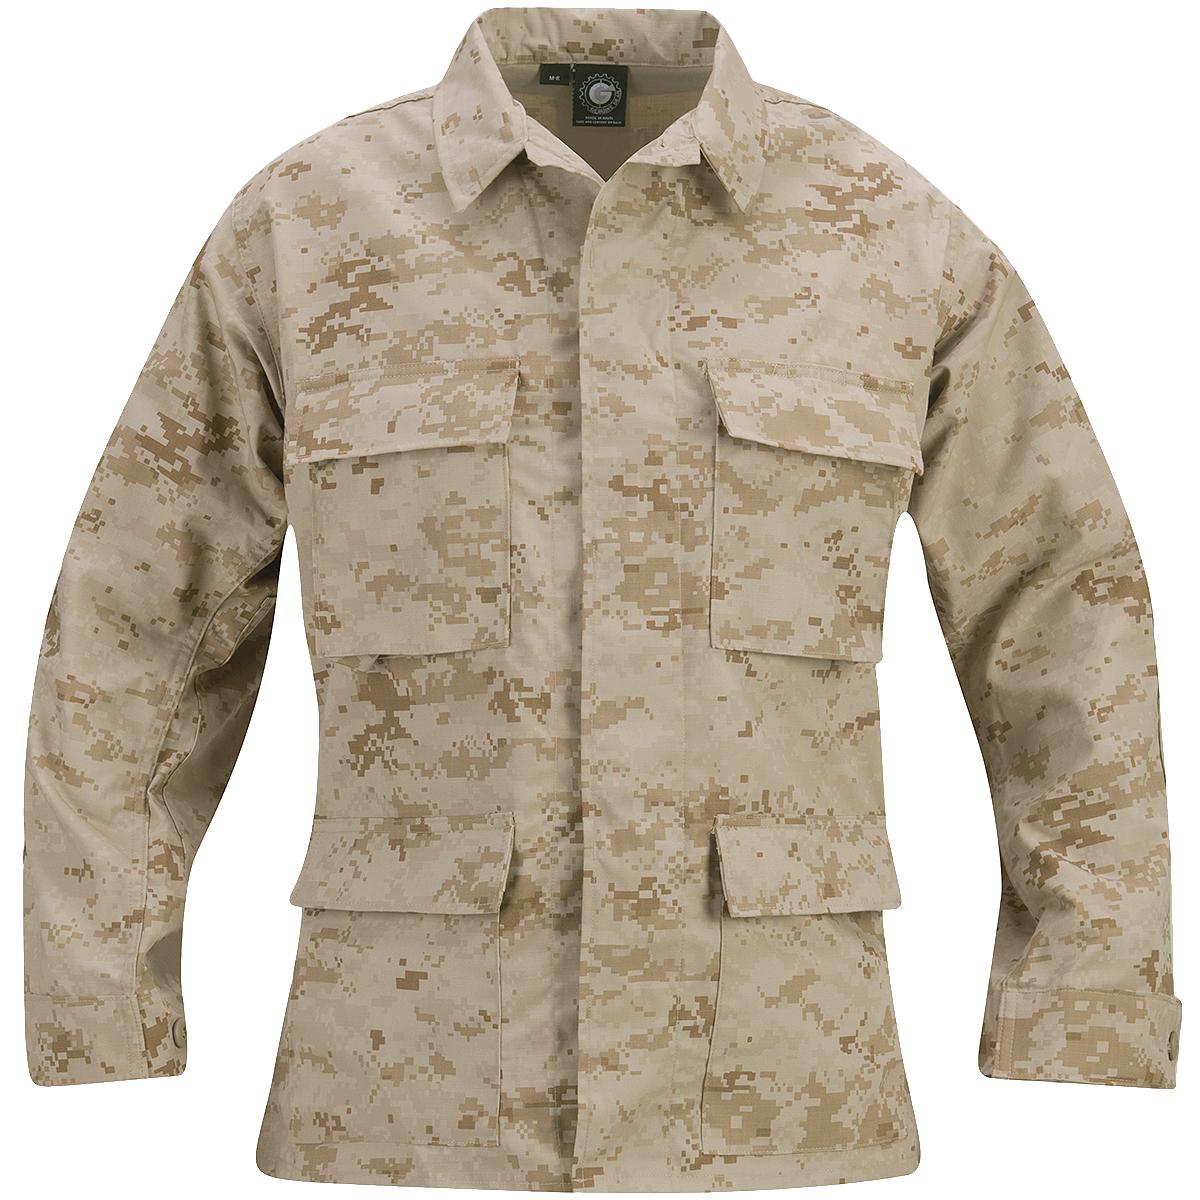 Propper-Hombre-BDU-Capa-Genuine-Patrulla-Combat-Seguridad-Digital-Desert-Camo